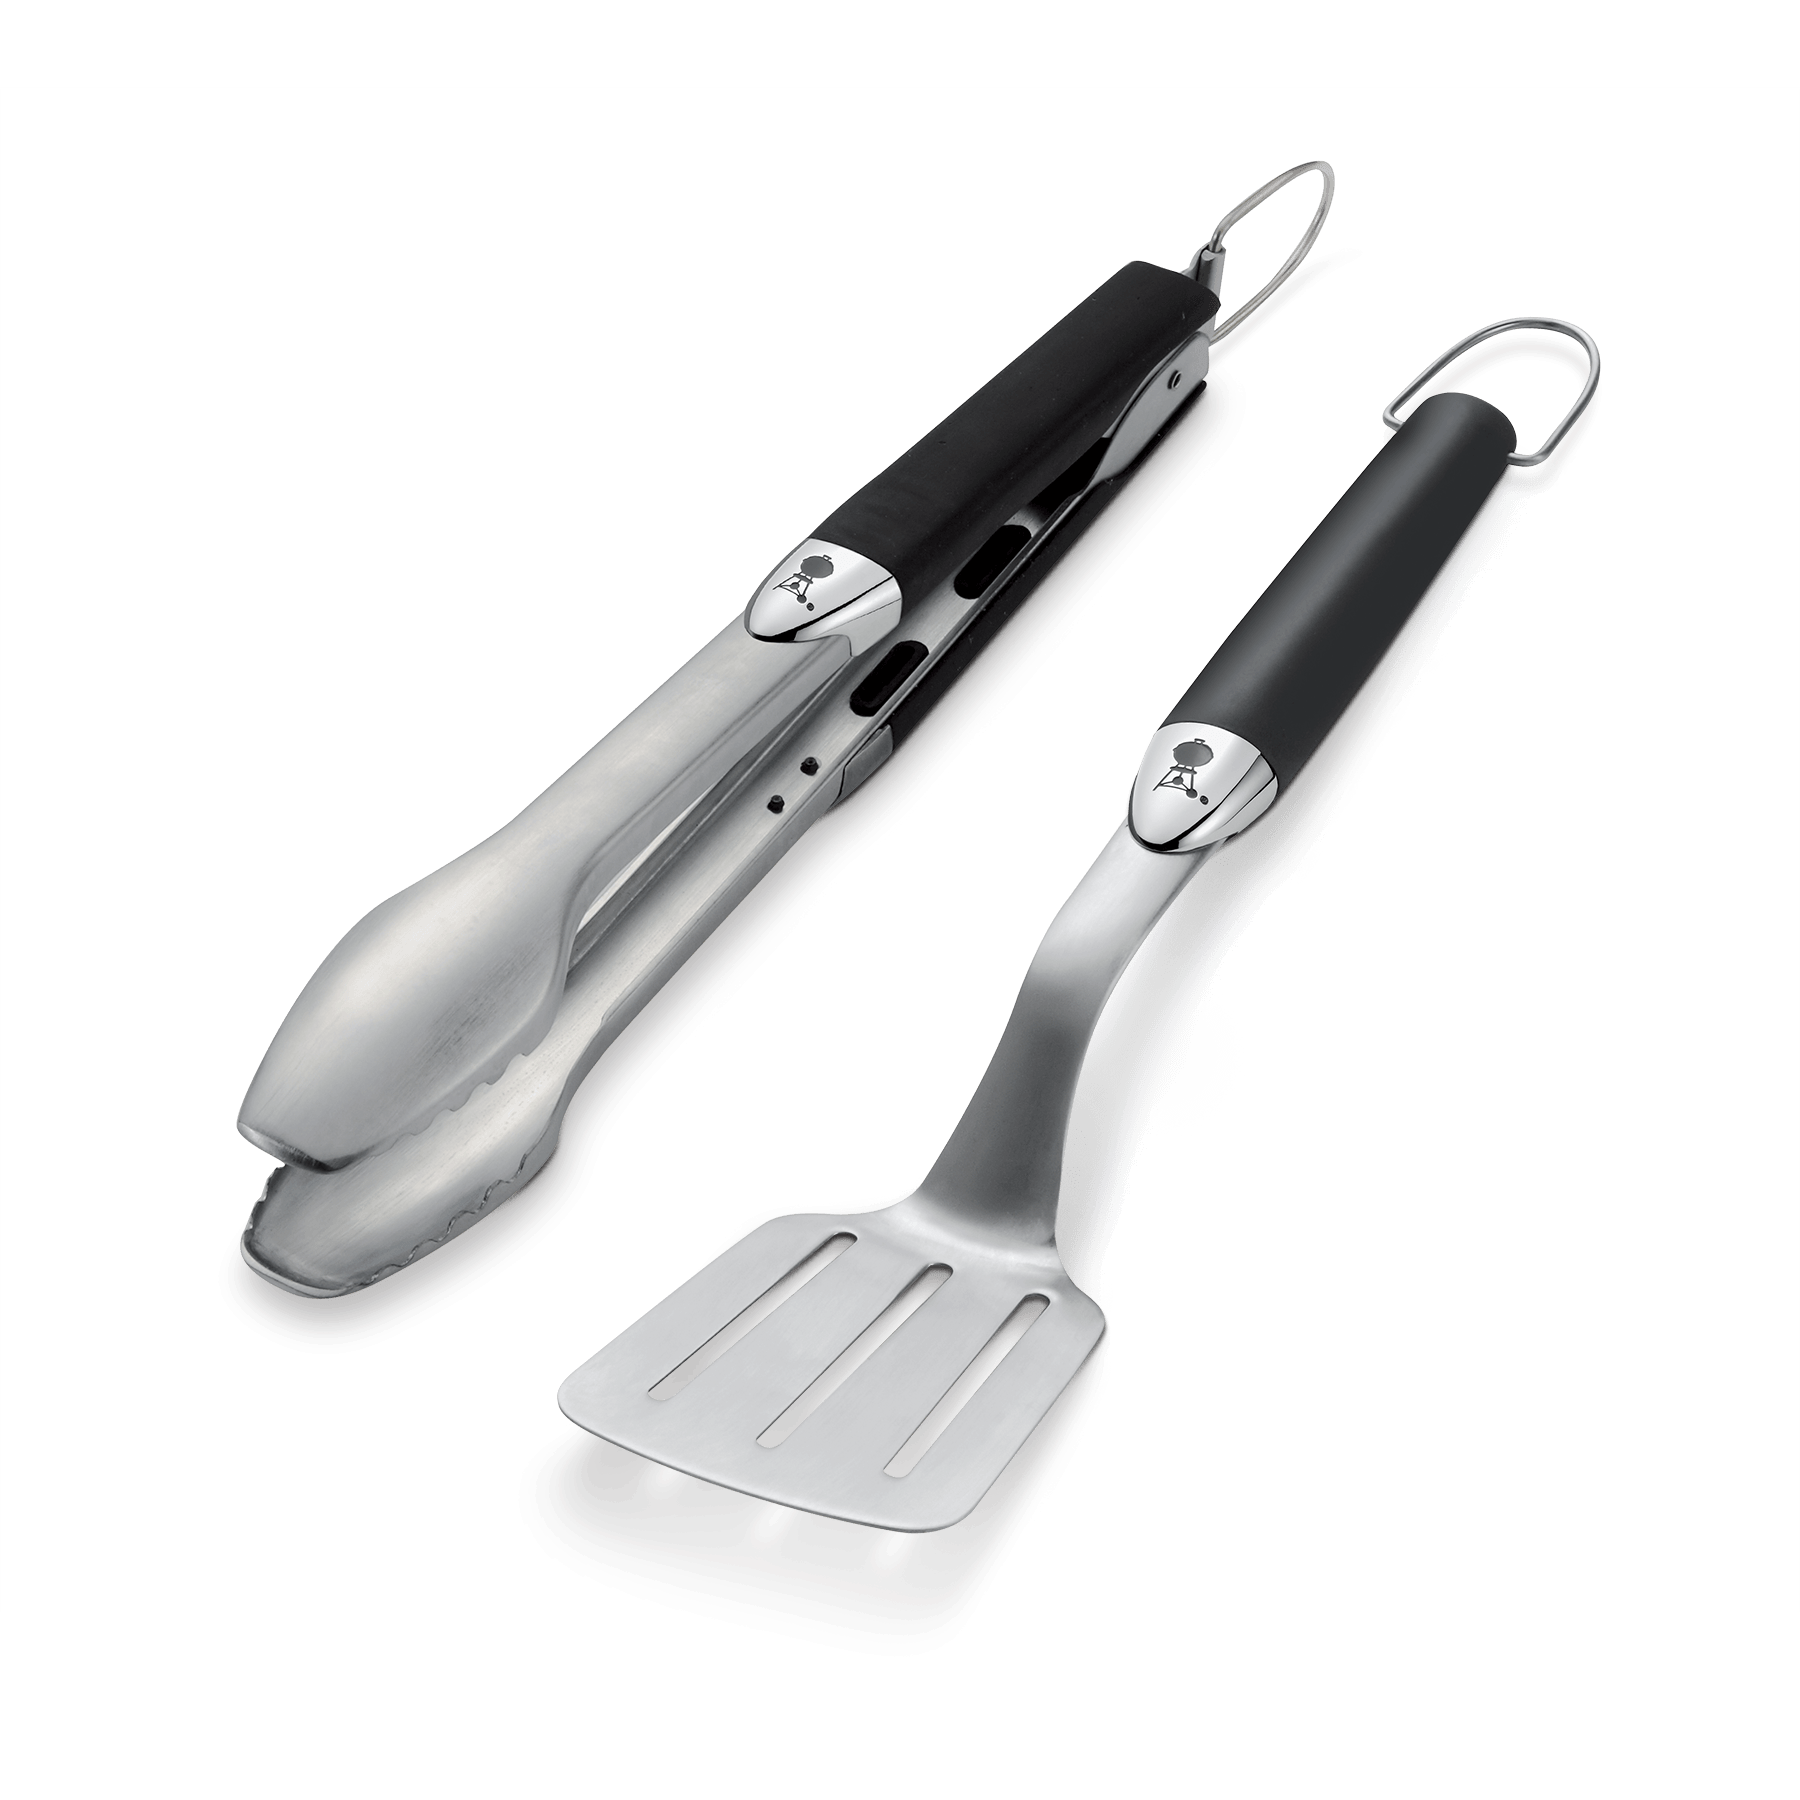 New Hi-Gear 3 Piece Premium BBQ Tool Set